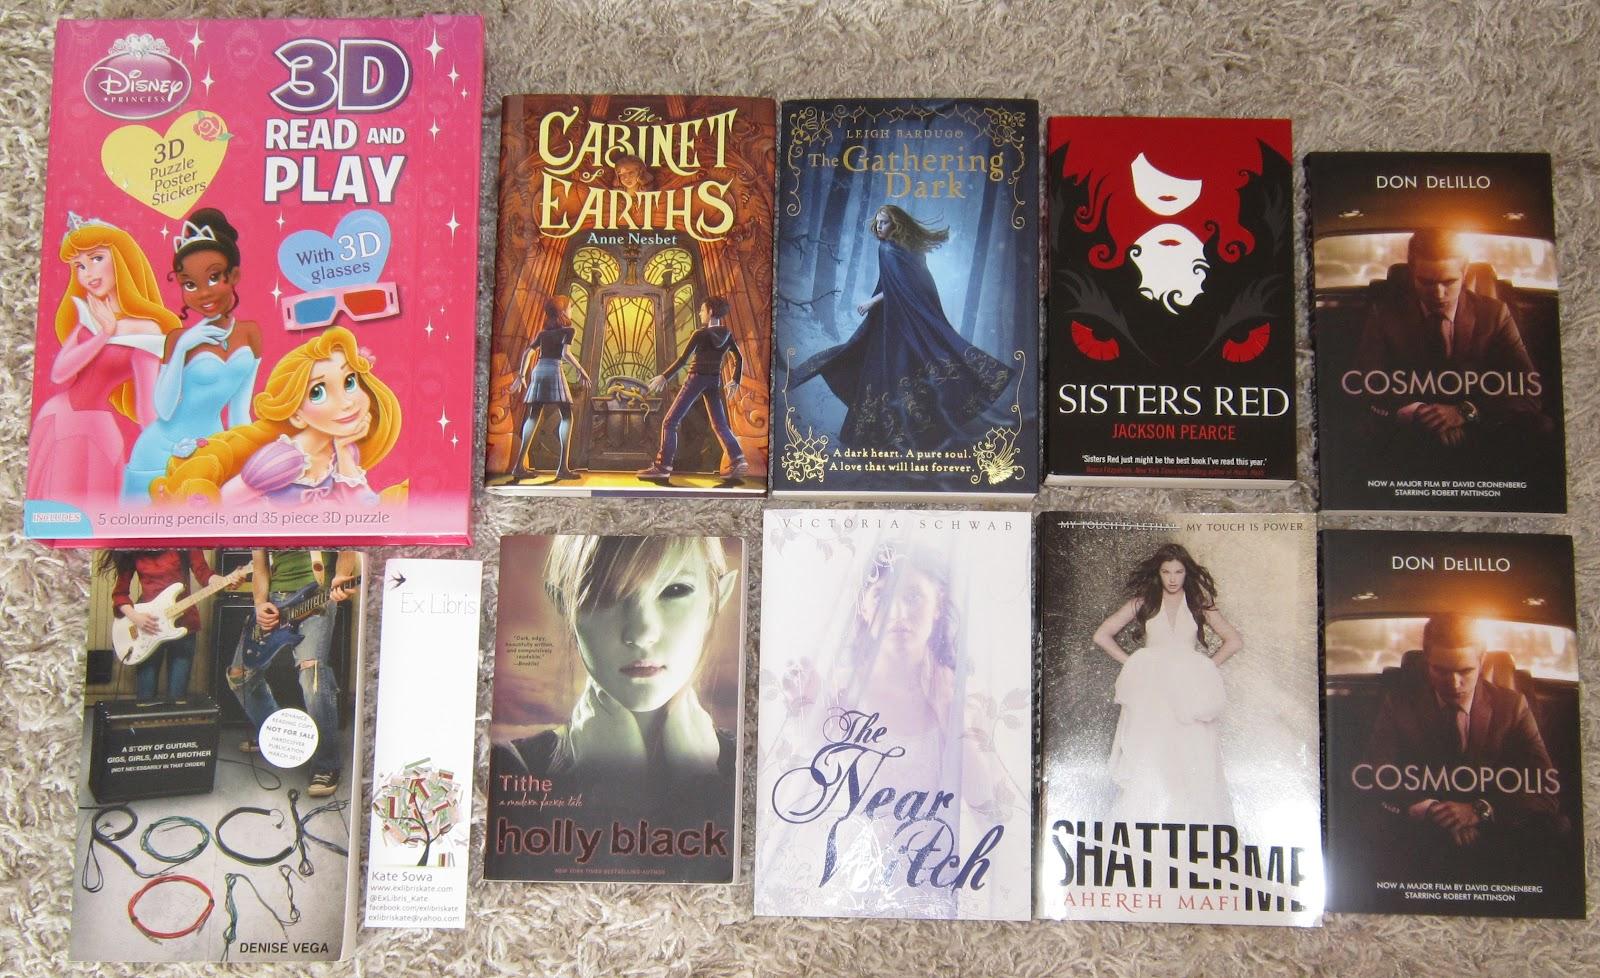 Carina's Books: May 2012